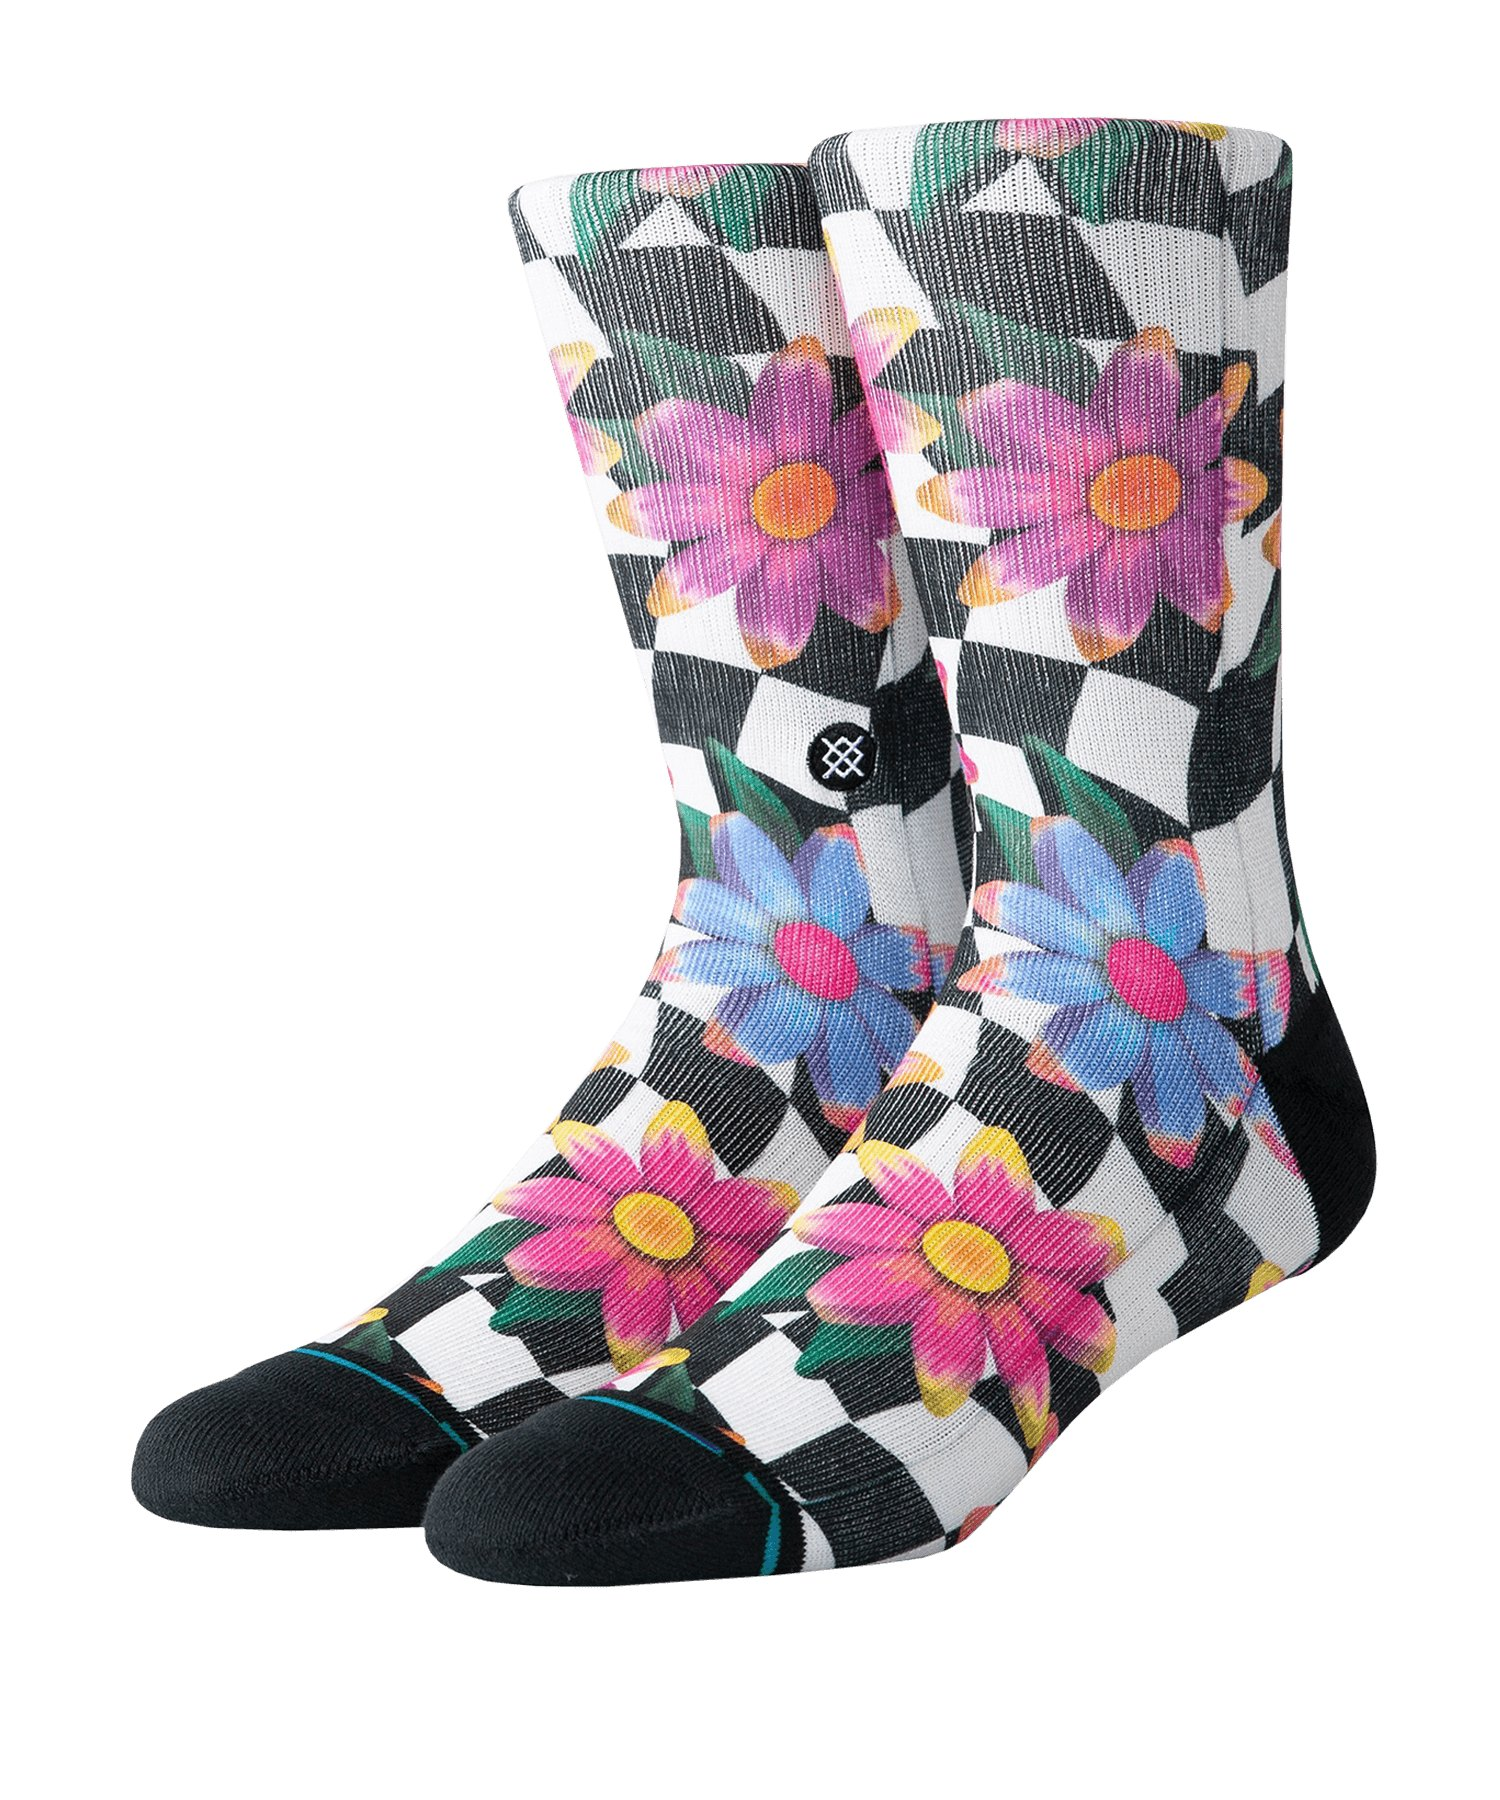 Stance Socken Foundation Flower Rave Multi - weiss